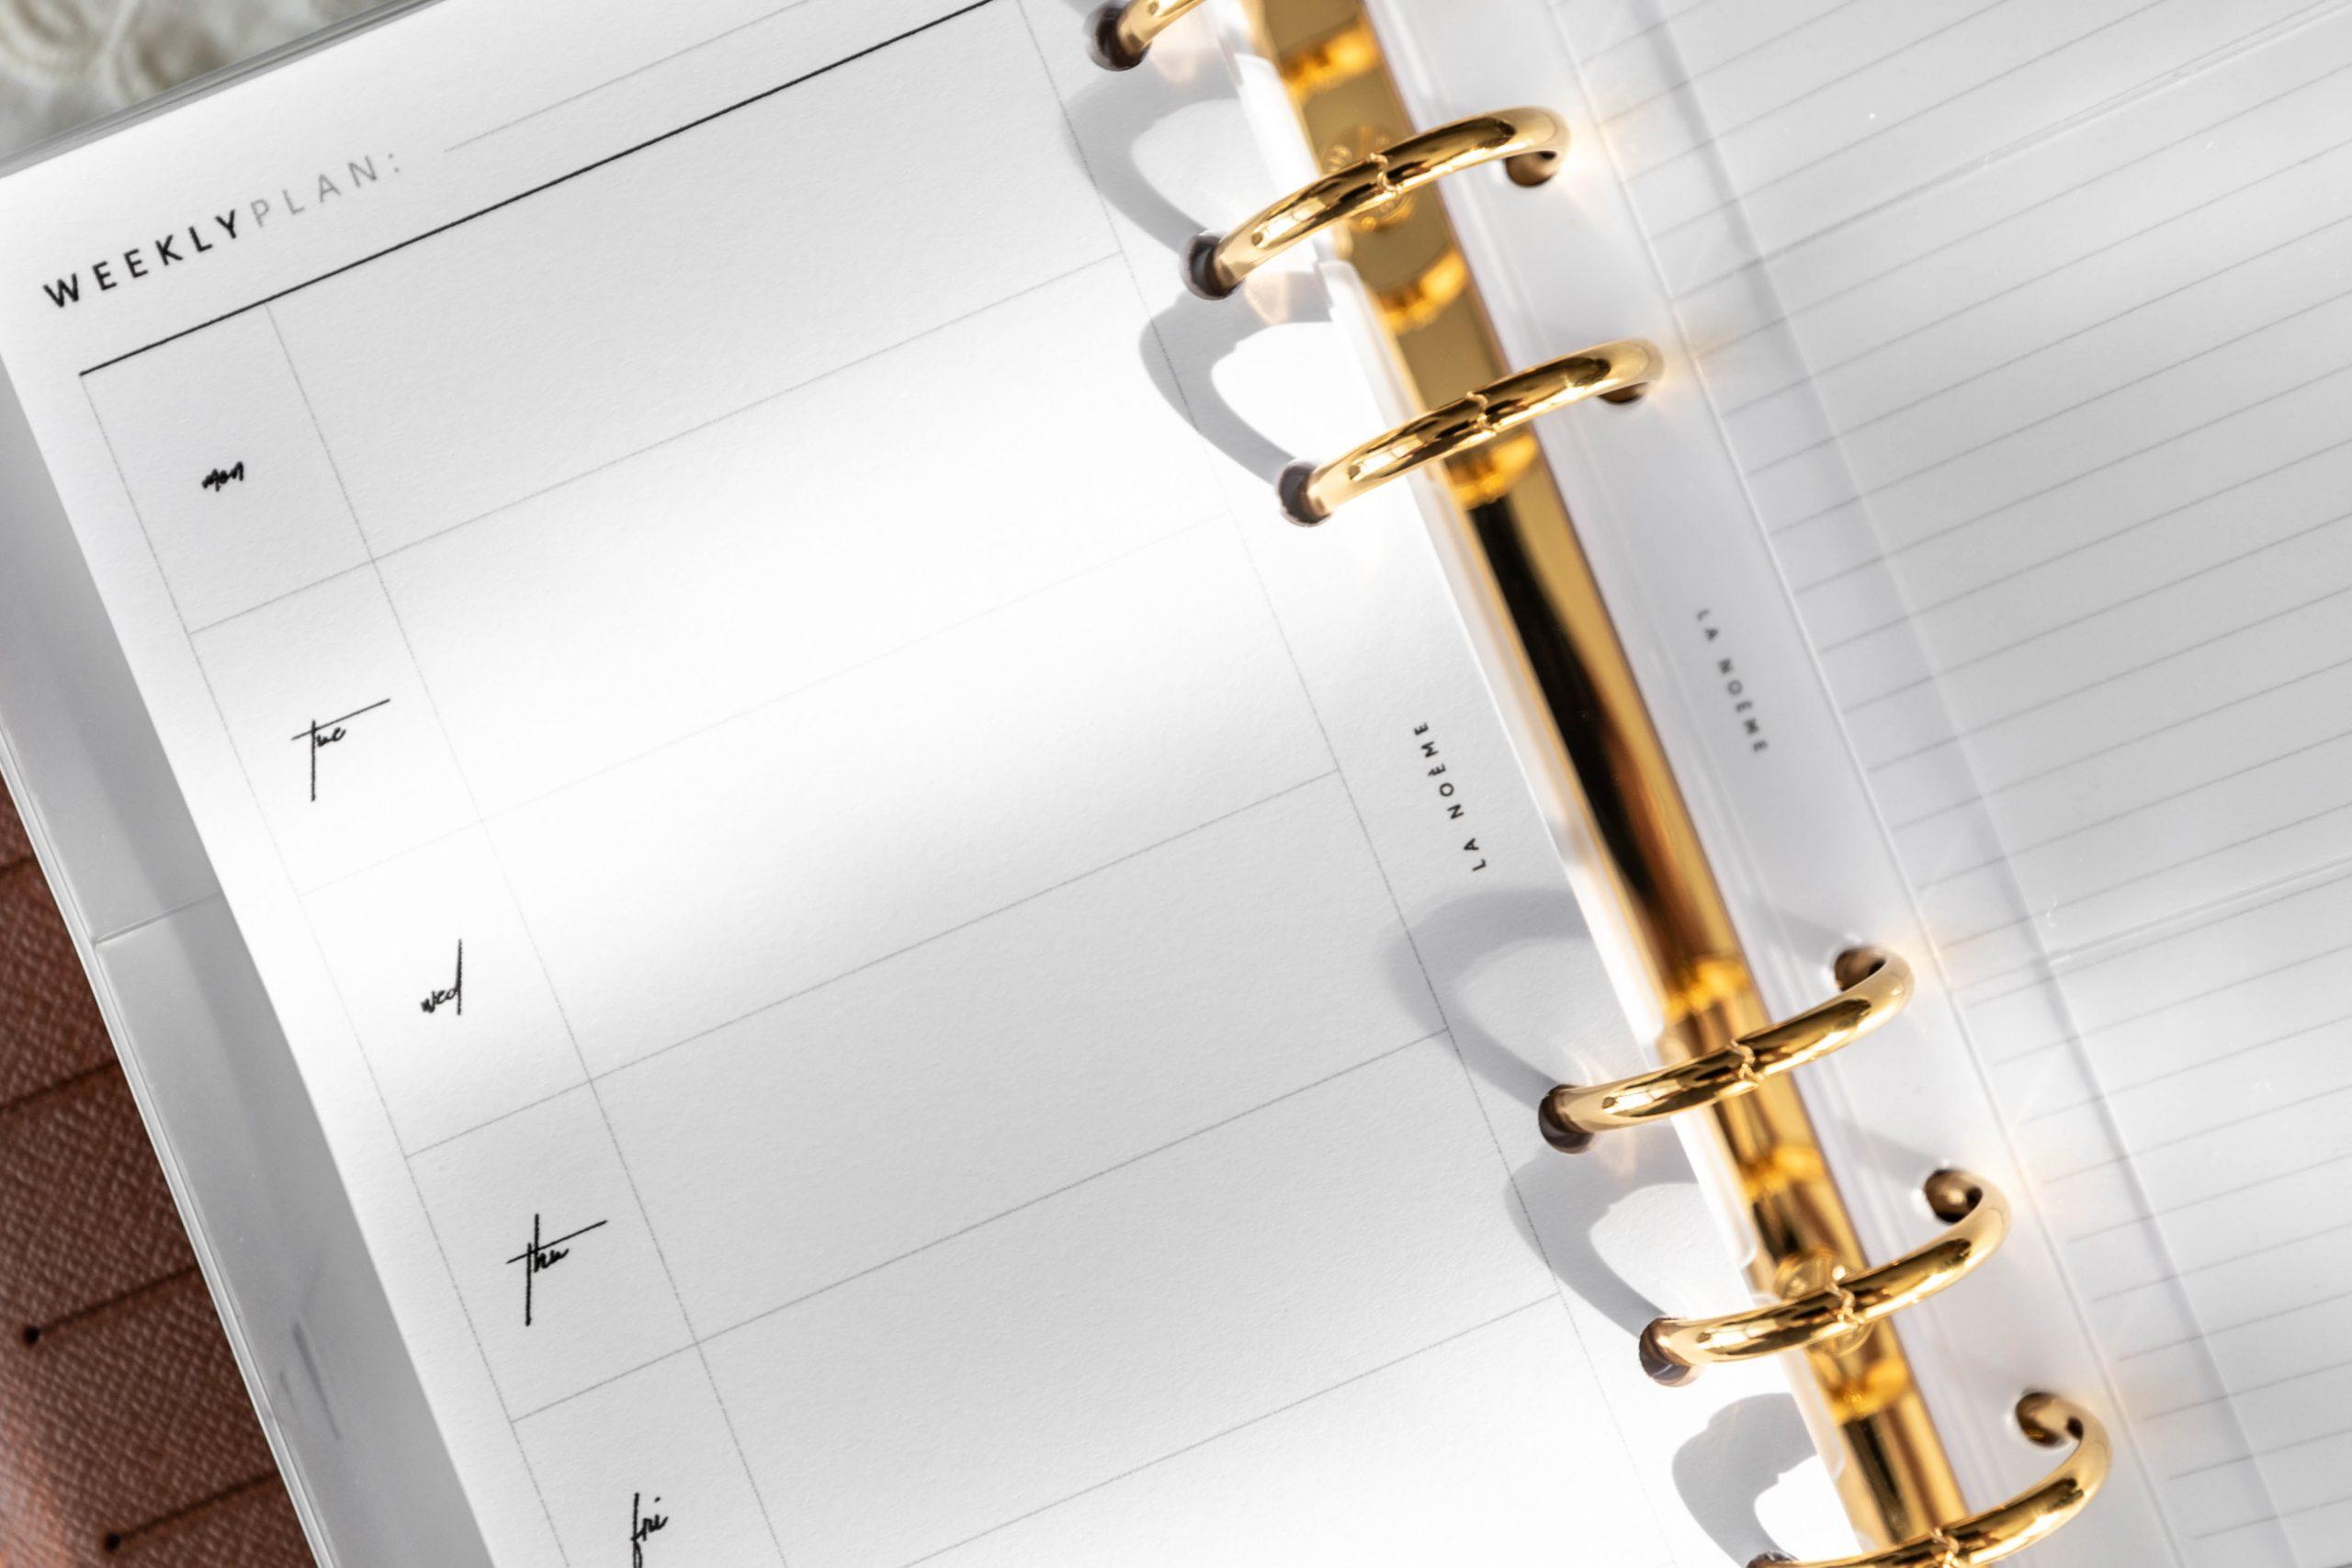 Hobonichi Style Planner Pages Louis Vuitton Agenda Setup by Annie Fairfax